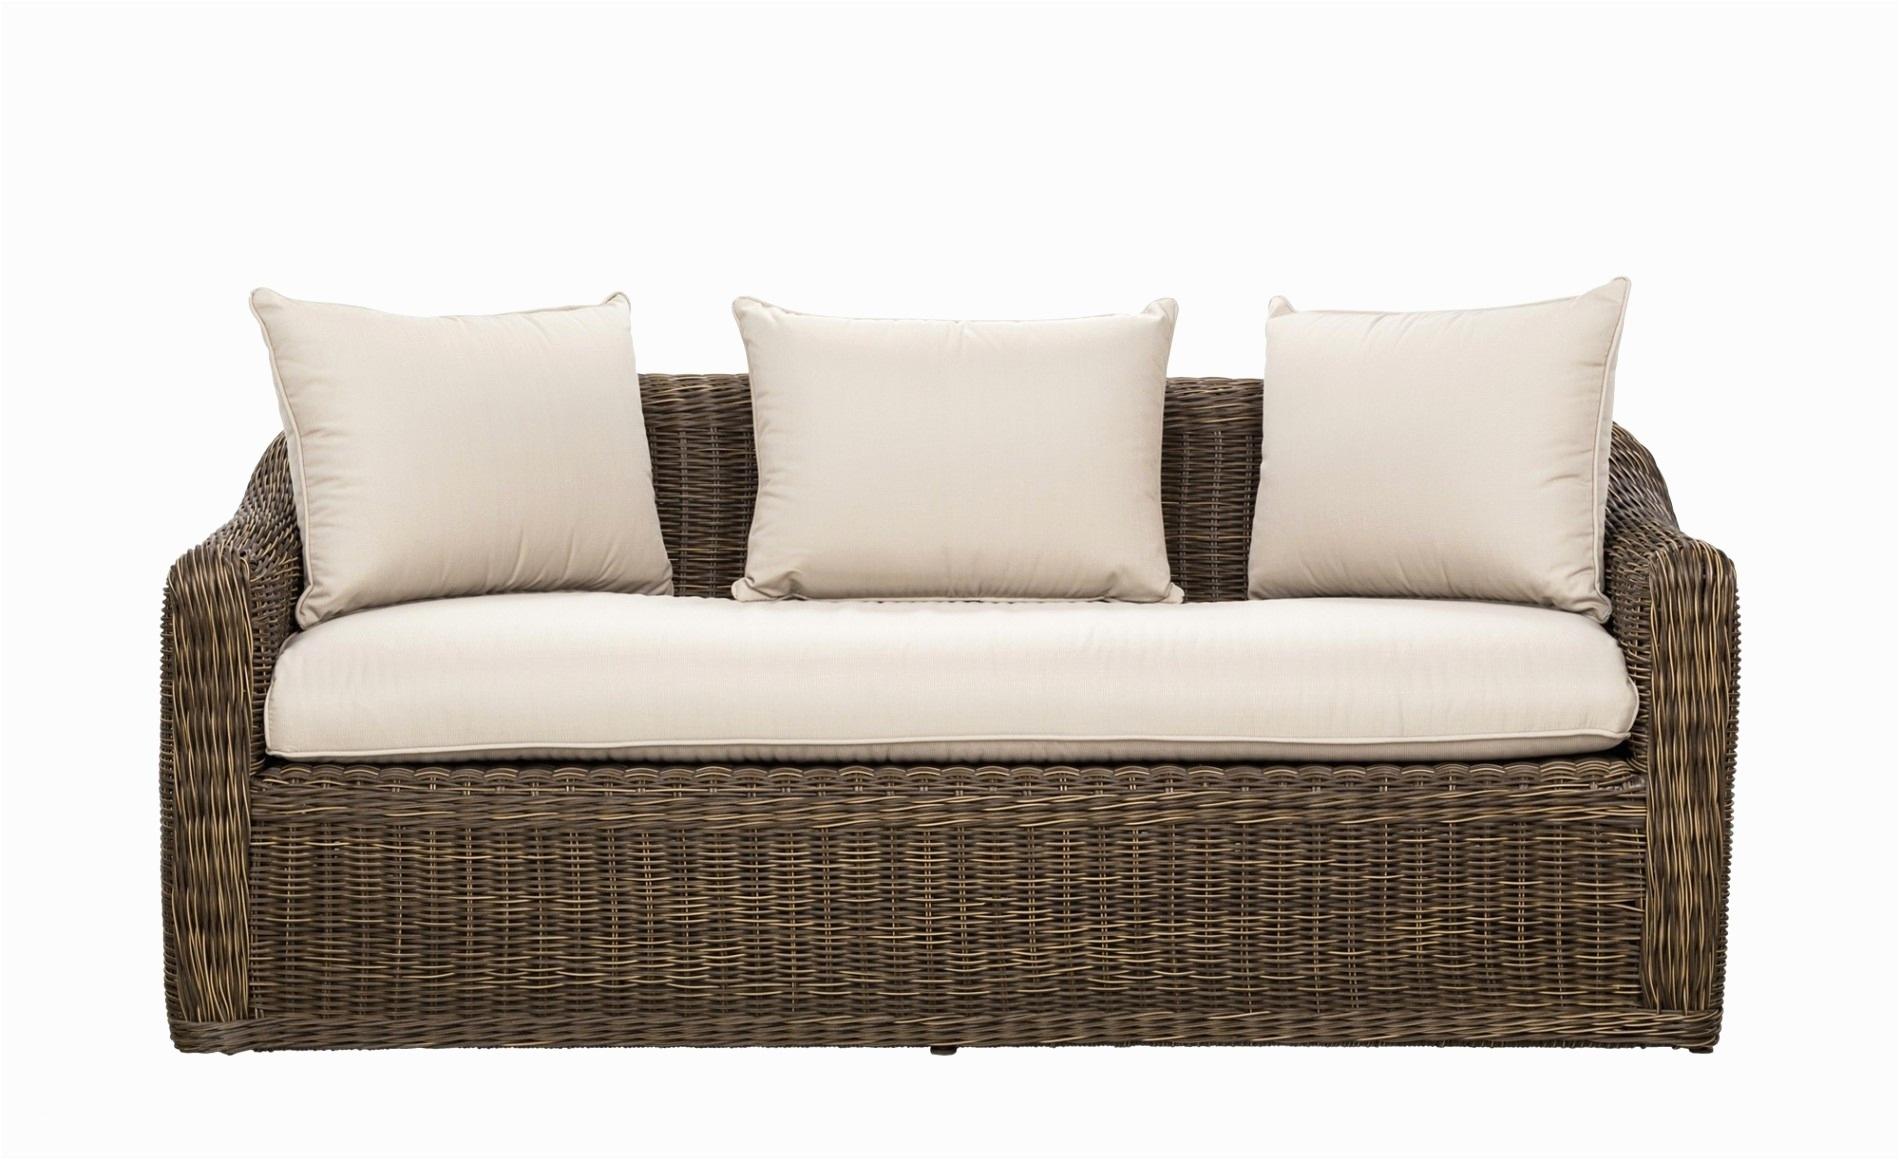 outstanding chair turns into bed 2 converts to single home designs sofa twin sizesofa singlesofa sizearm ikea sleeper uk